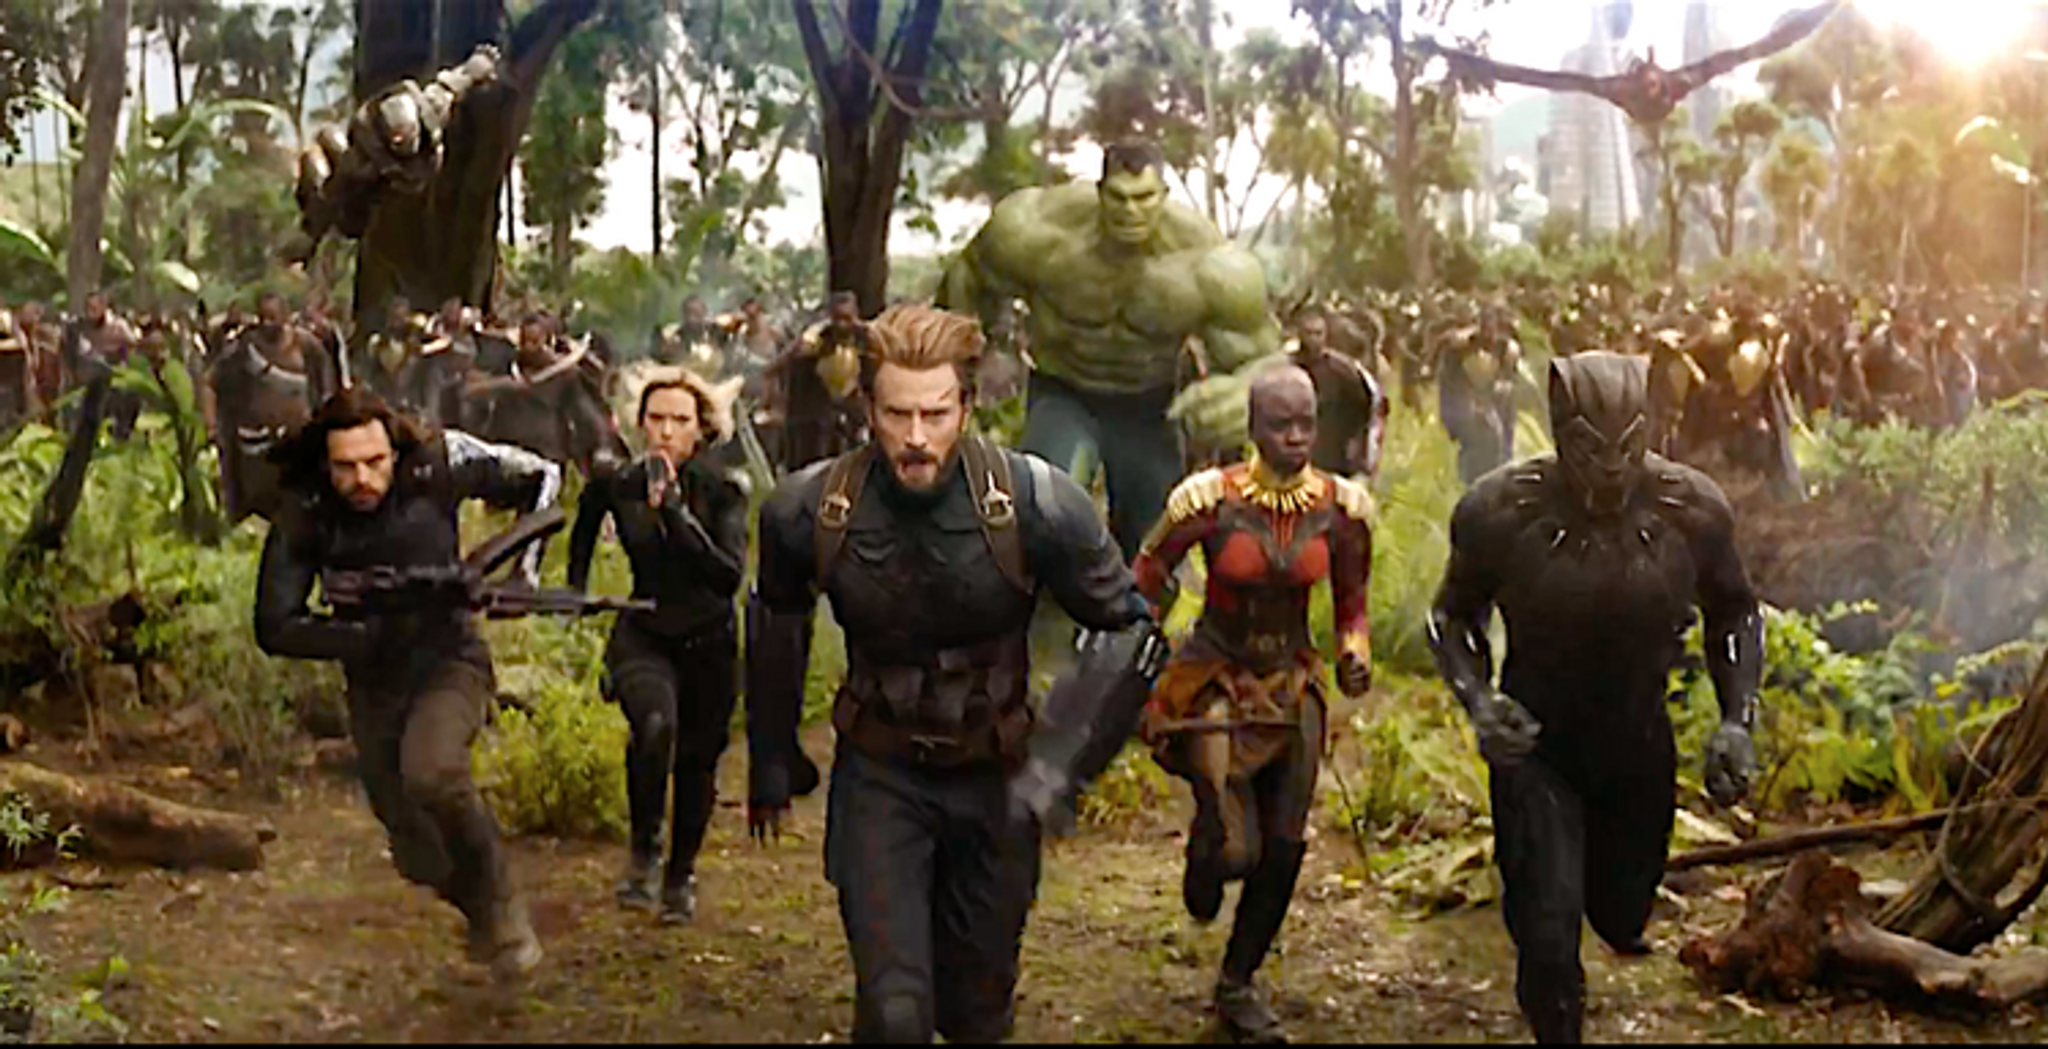 Marvel Studios announces new 'Avengers: Infinity War' release date in the best way